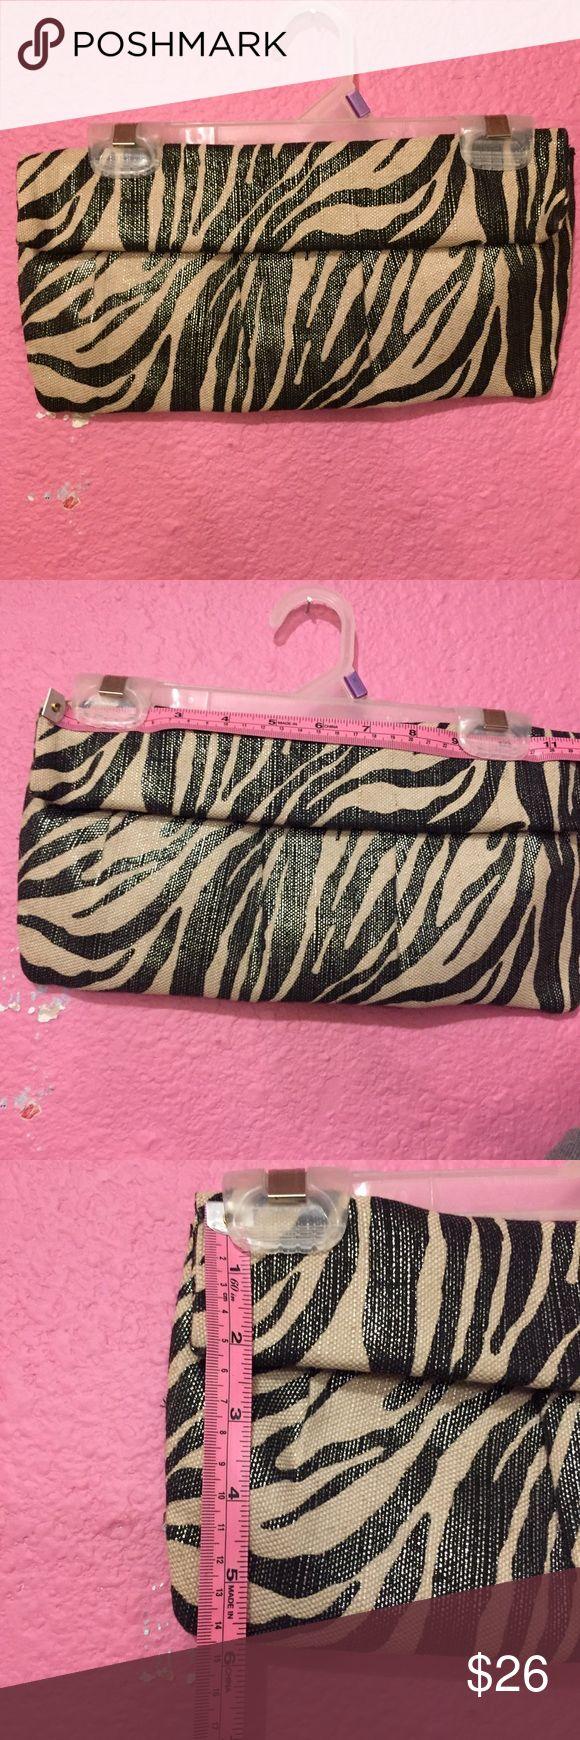 Zebra print cloth clutch handbag purse. Black & ta Zebra print cloth clutch handbag purse. Black & tan Style & Co Bags Clutches & Wristlets